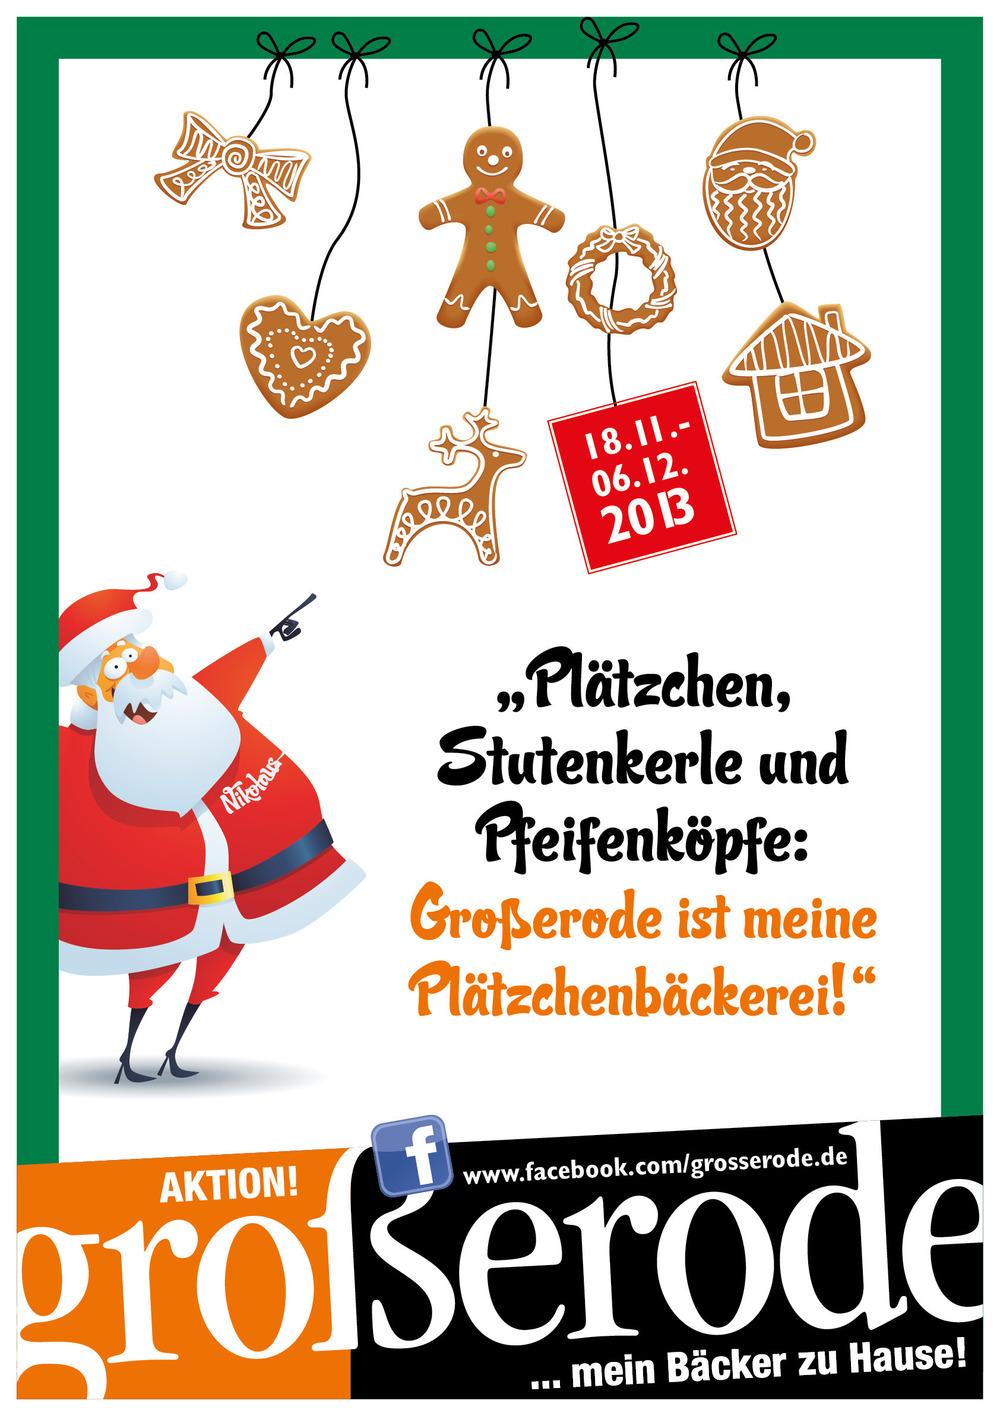 20131018_Grosserode_Plaetzchenaktion_web.jpg